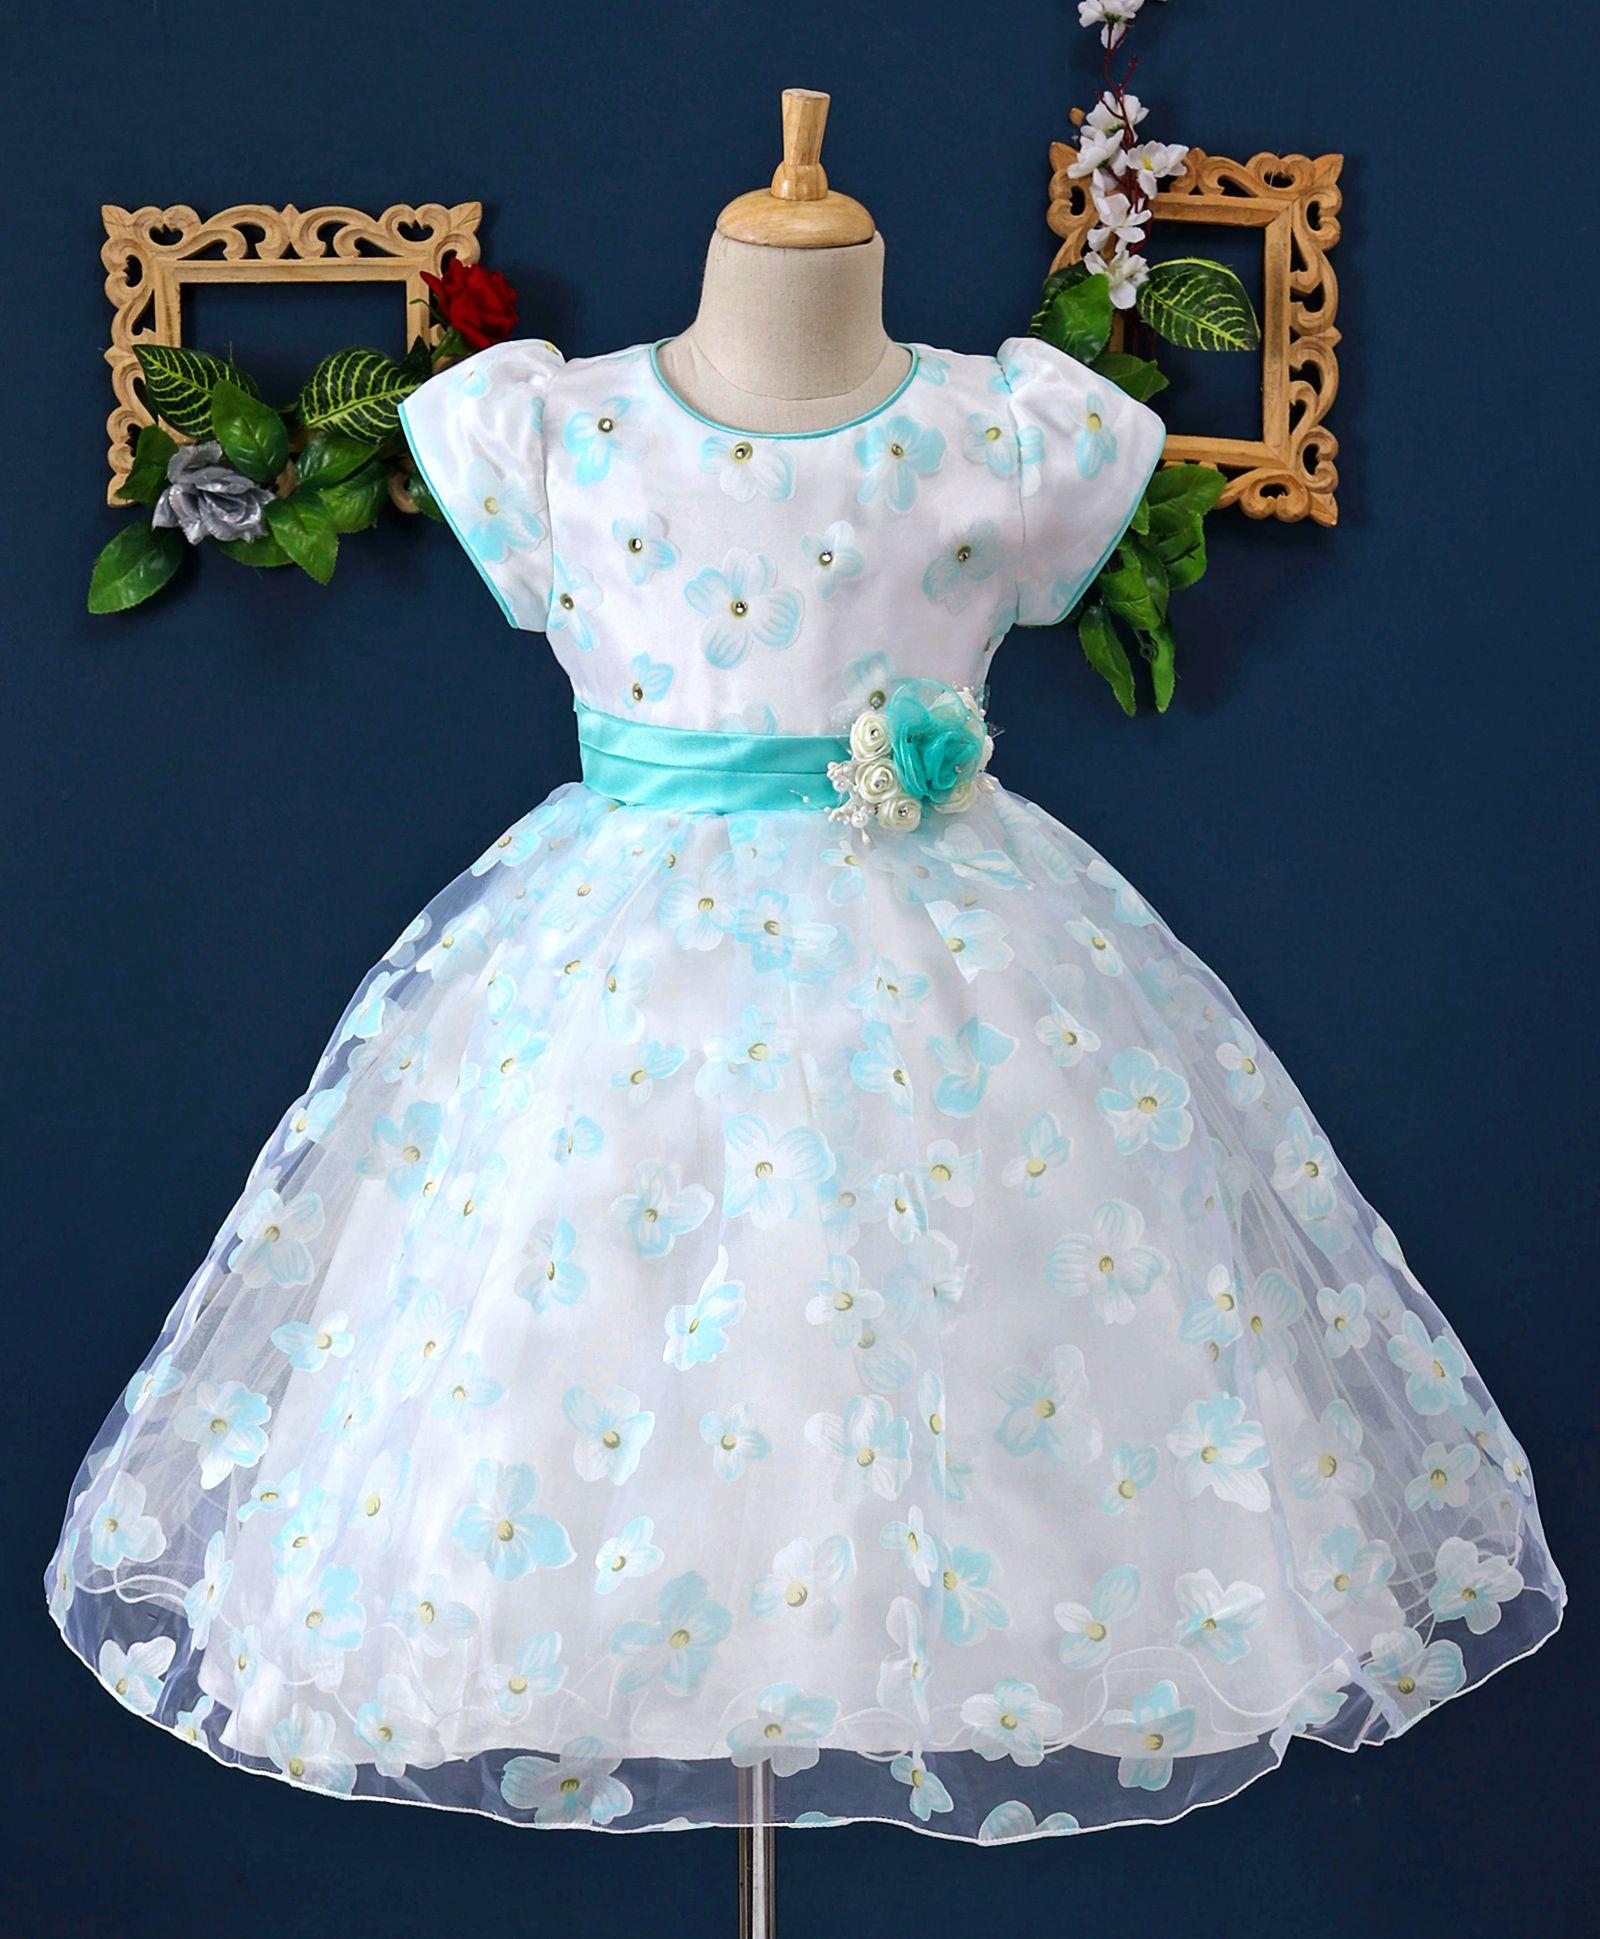 5262e407a420 Mark   Mia Flower Theme Cap Sleeves Puffy Dress - White. 0 to 3 Months